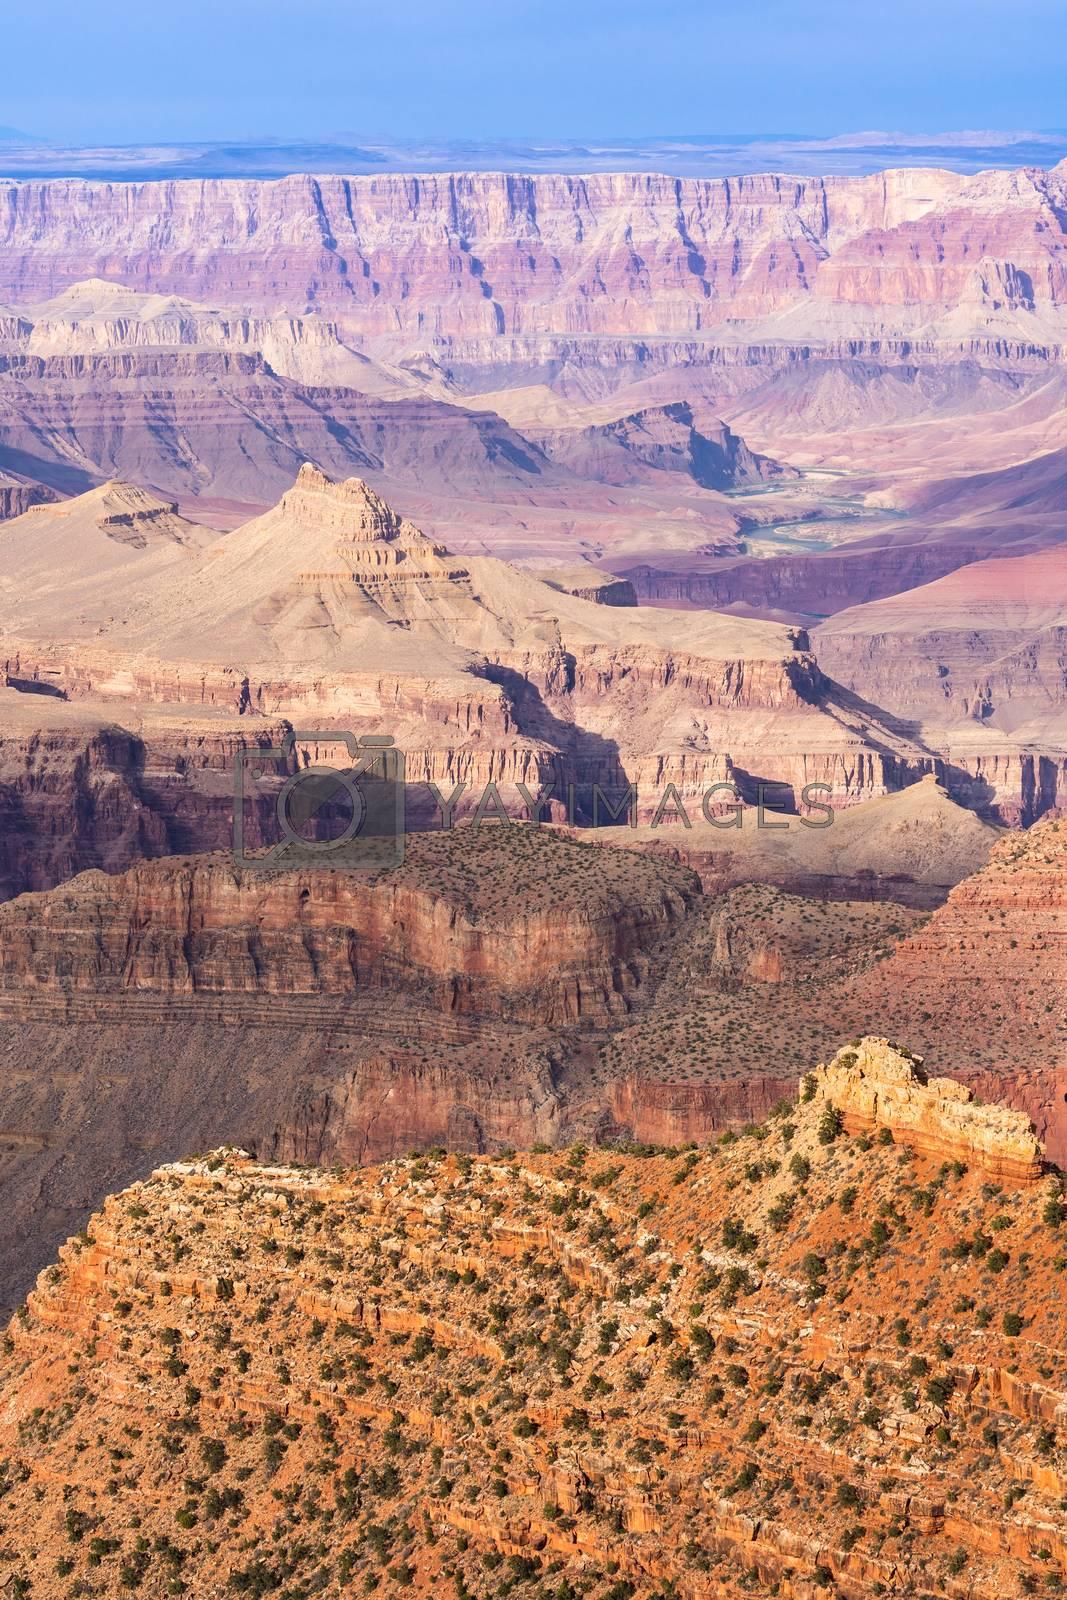 South rim of Grand Canyon in Arizona USA